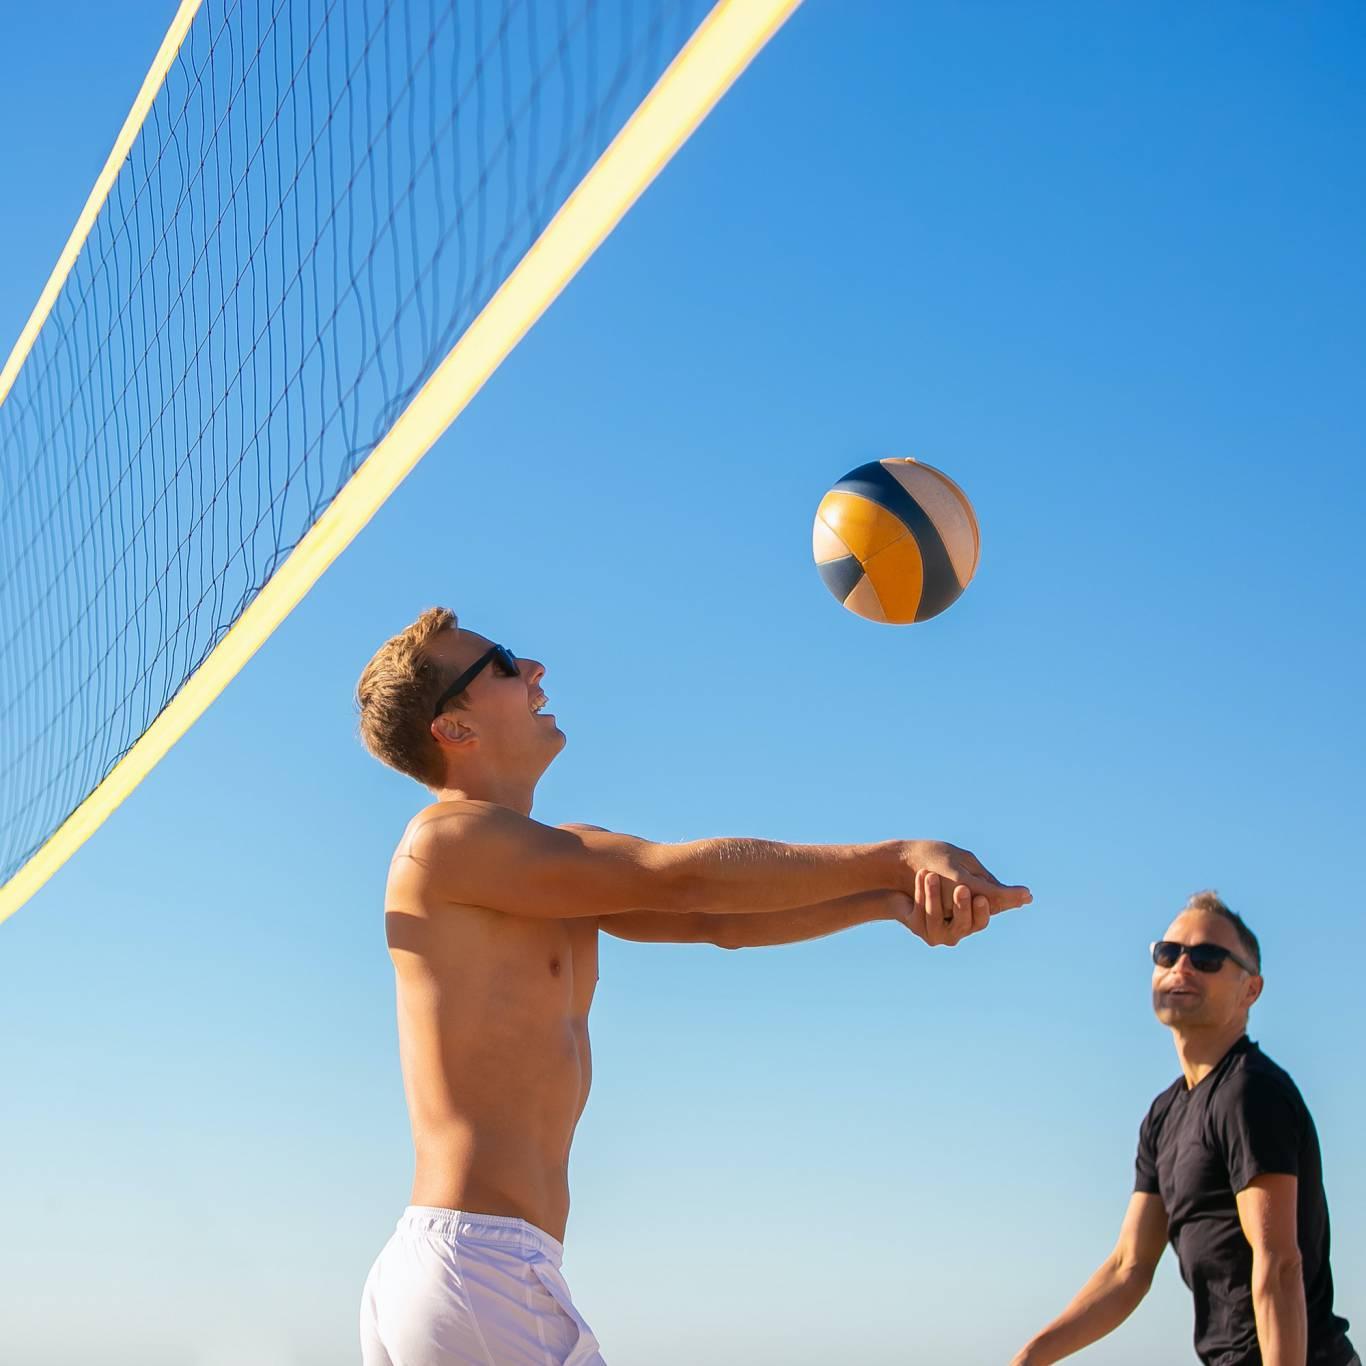 Santa-Caterina-Village-Scalea-beach-volley